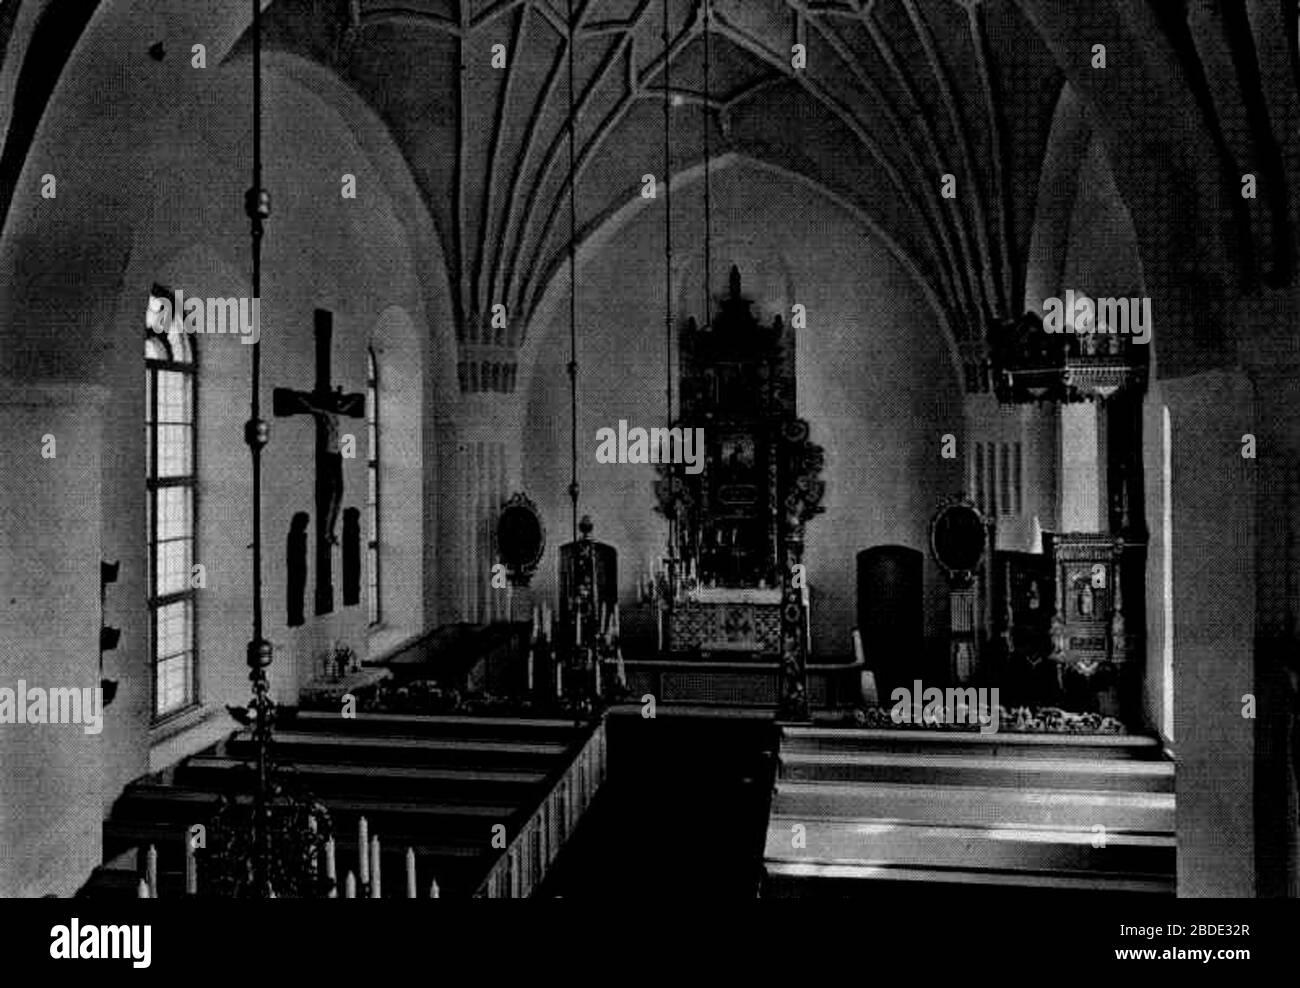 Hlsingtuna Church, Map, Church - Visit Glada Hudik